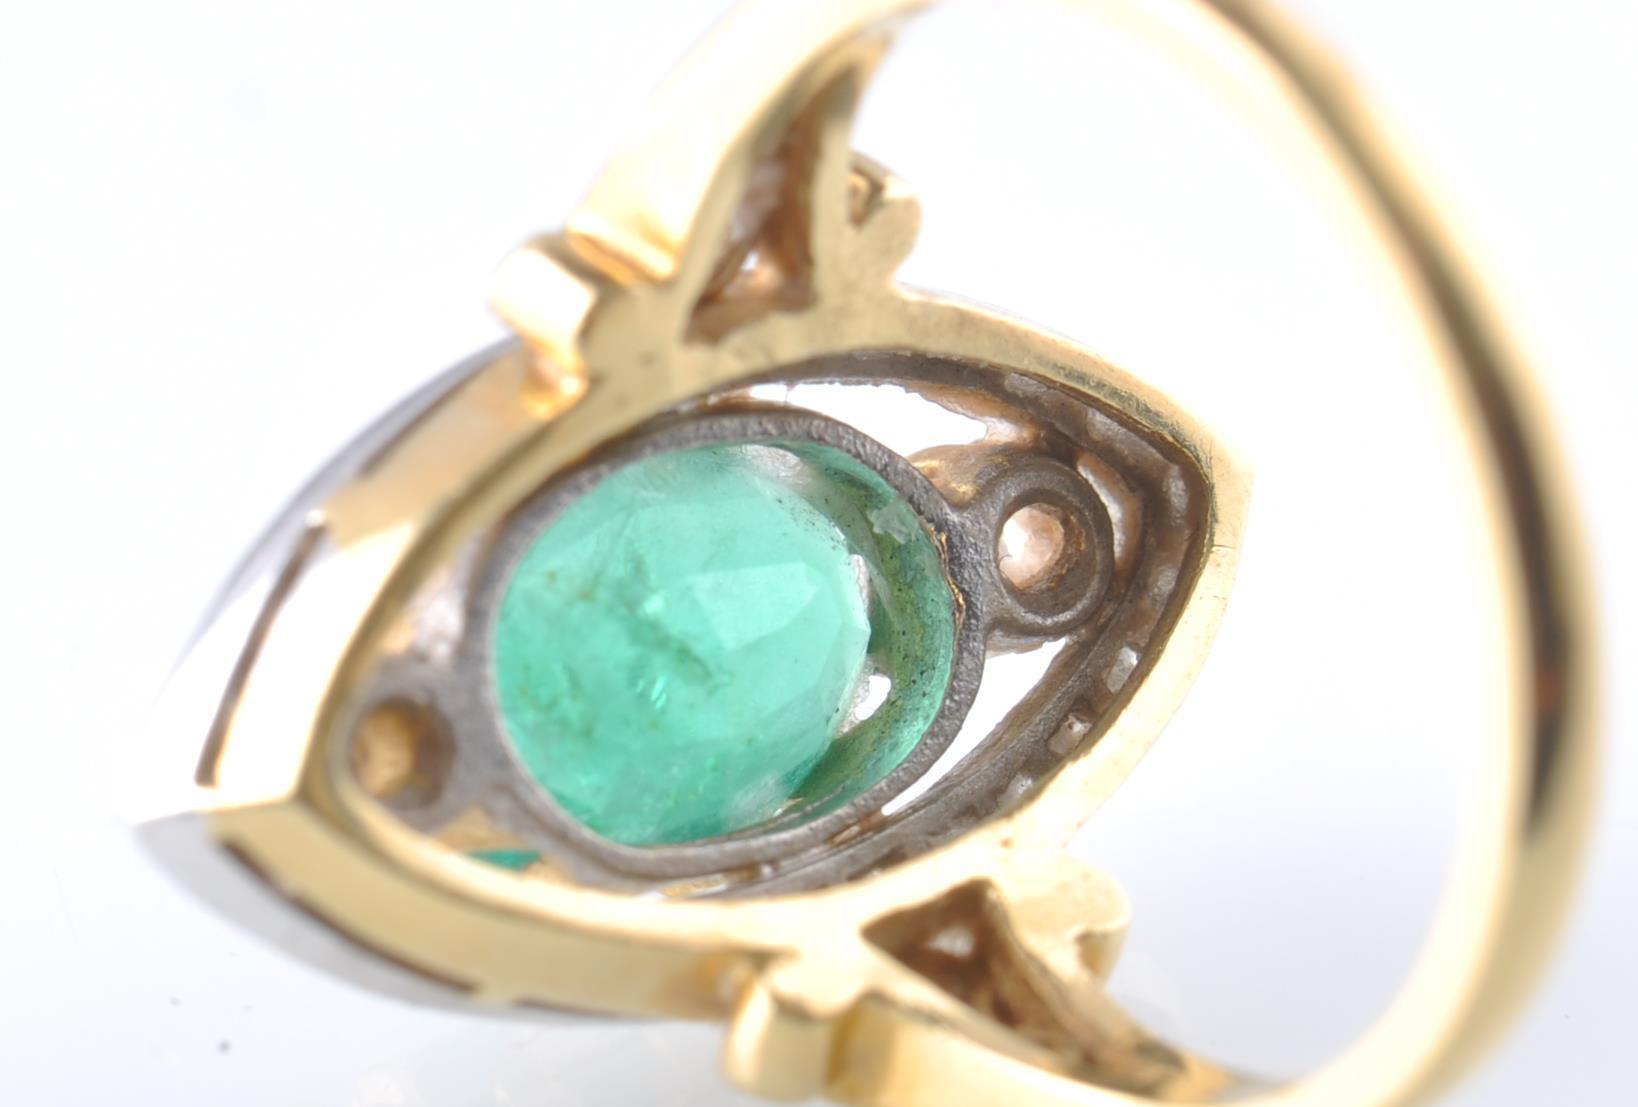 Lot 125 - A HALLMARKED 18CT GOD EMERALD AND DIAMOND RING